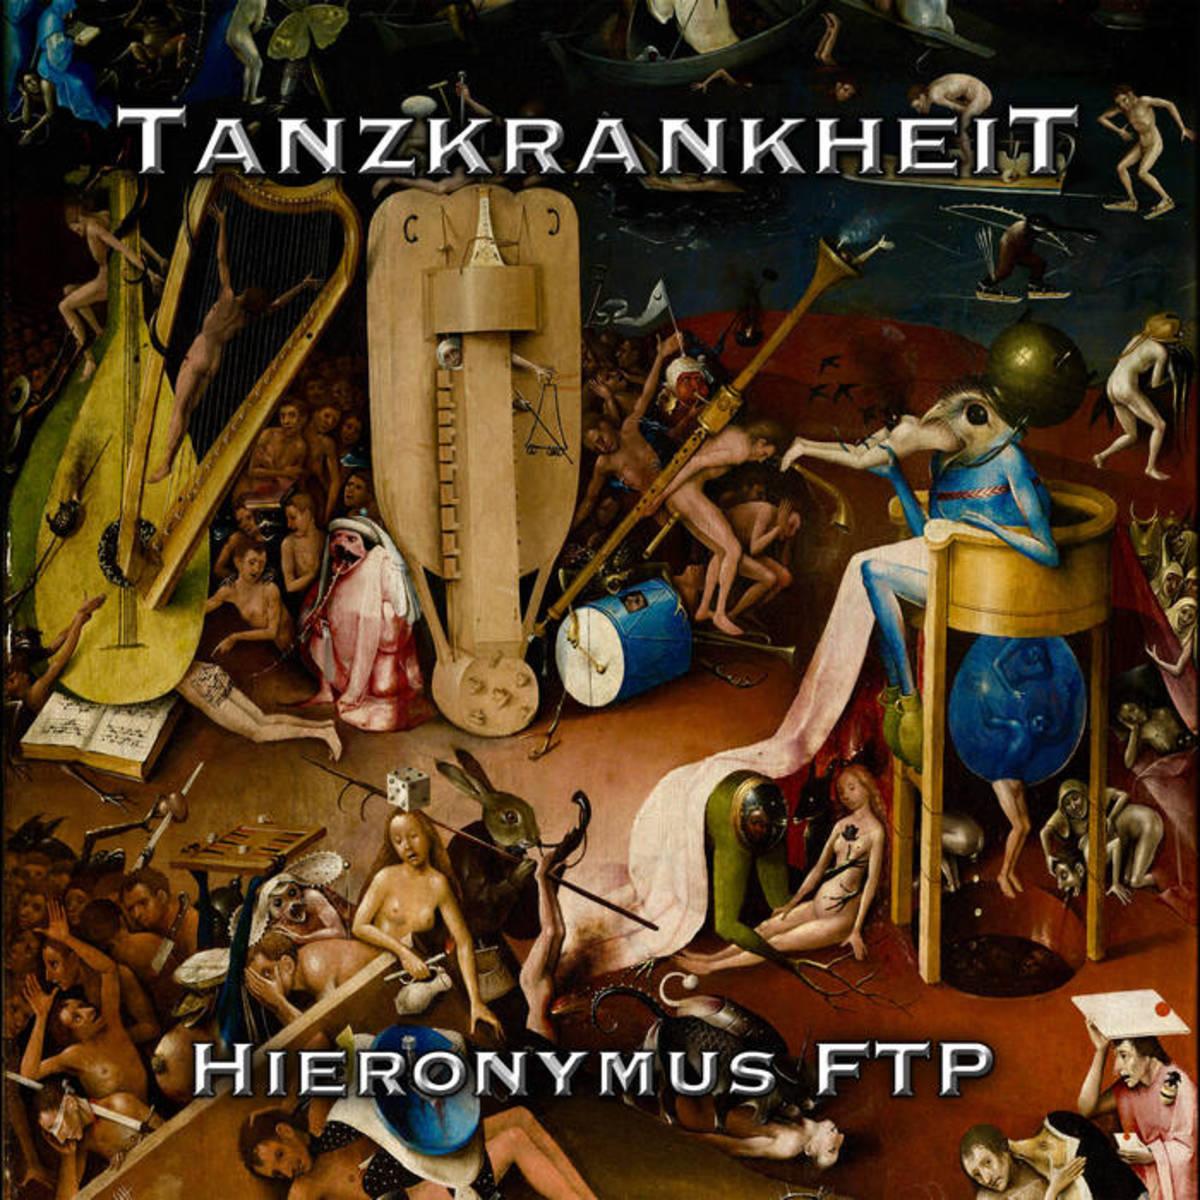 Electronic EP Review: Hieronymus FTP, Tanzkrankheit